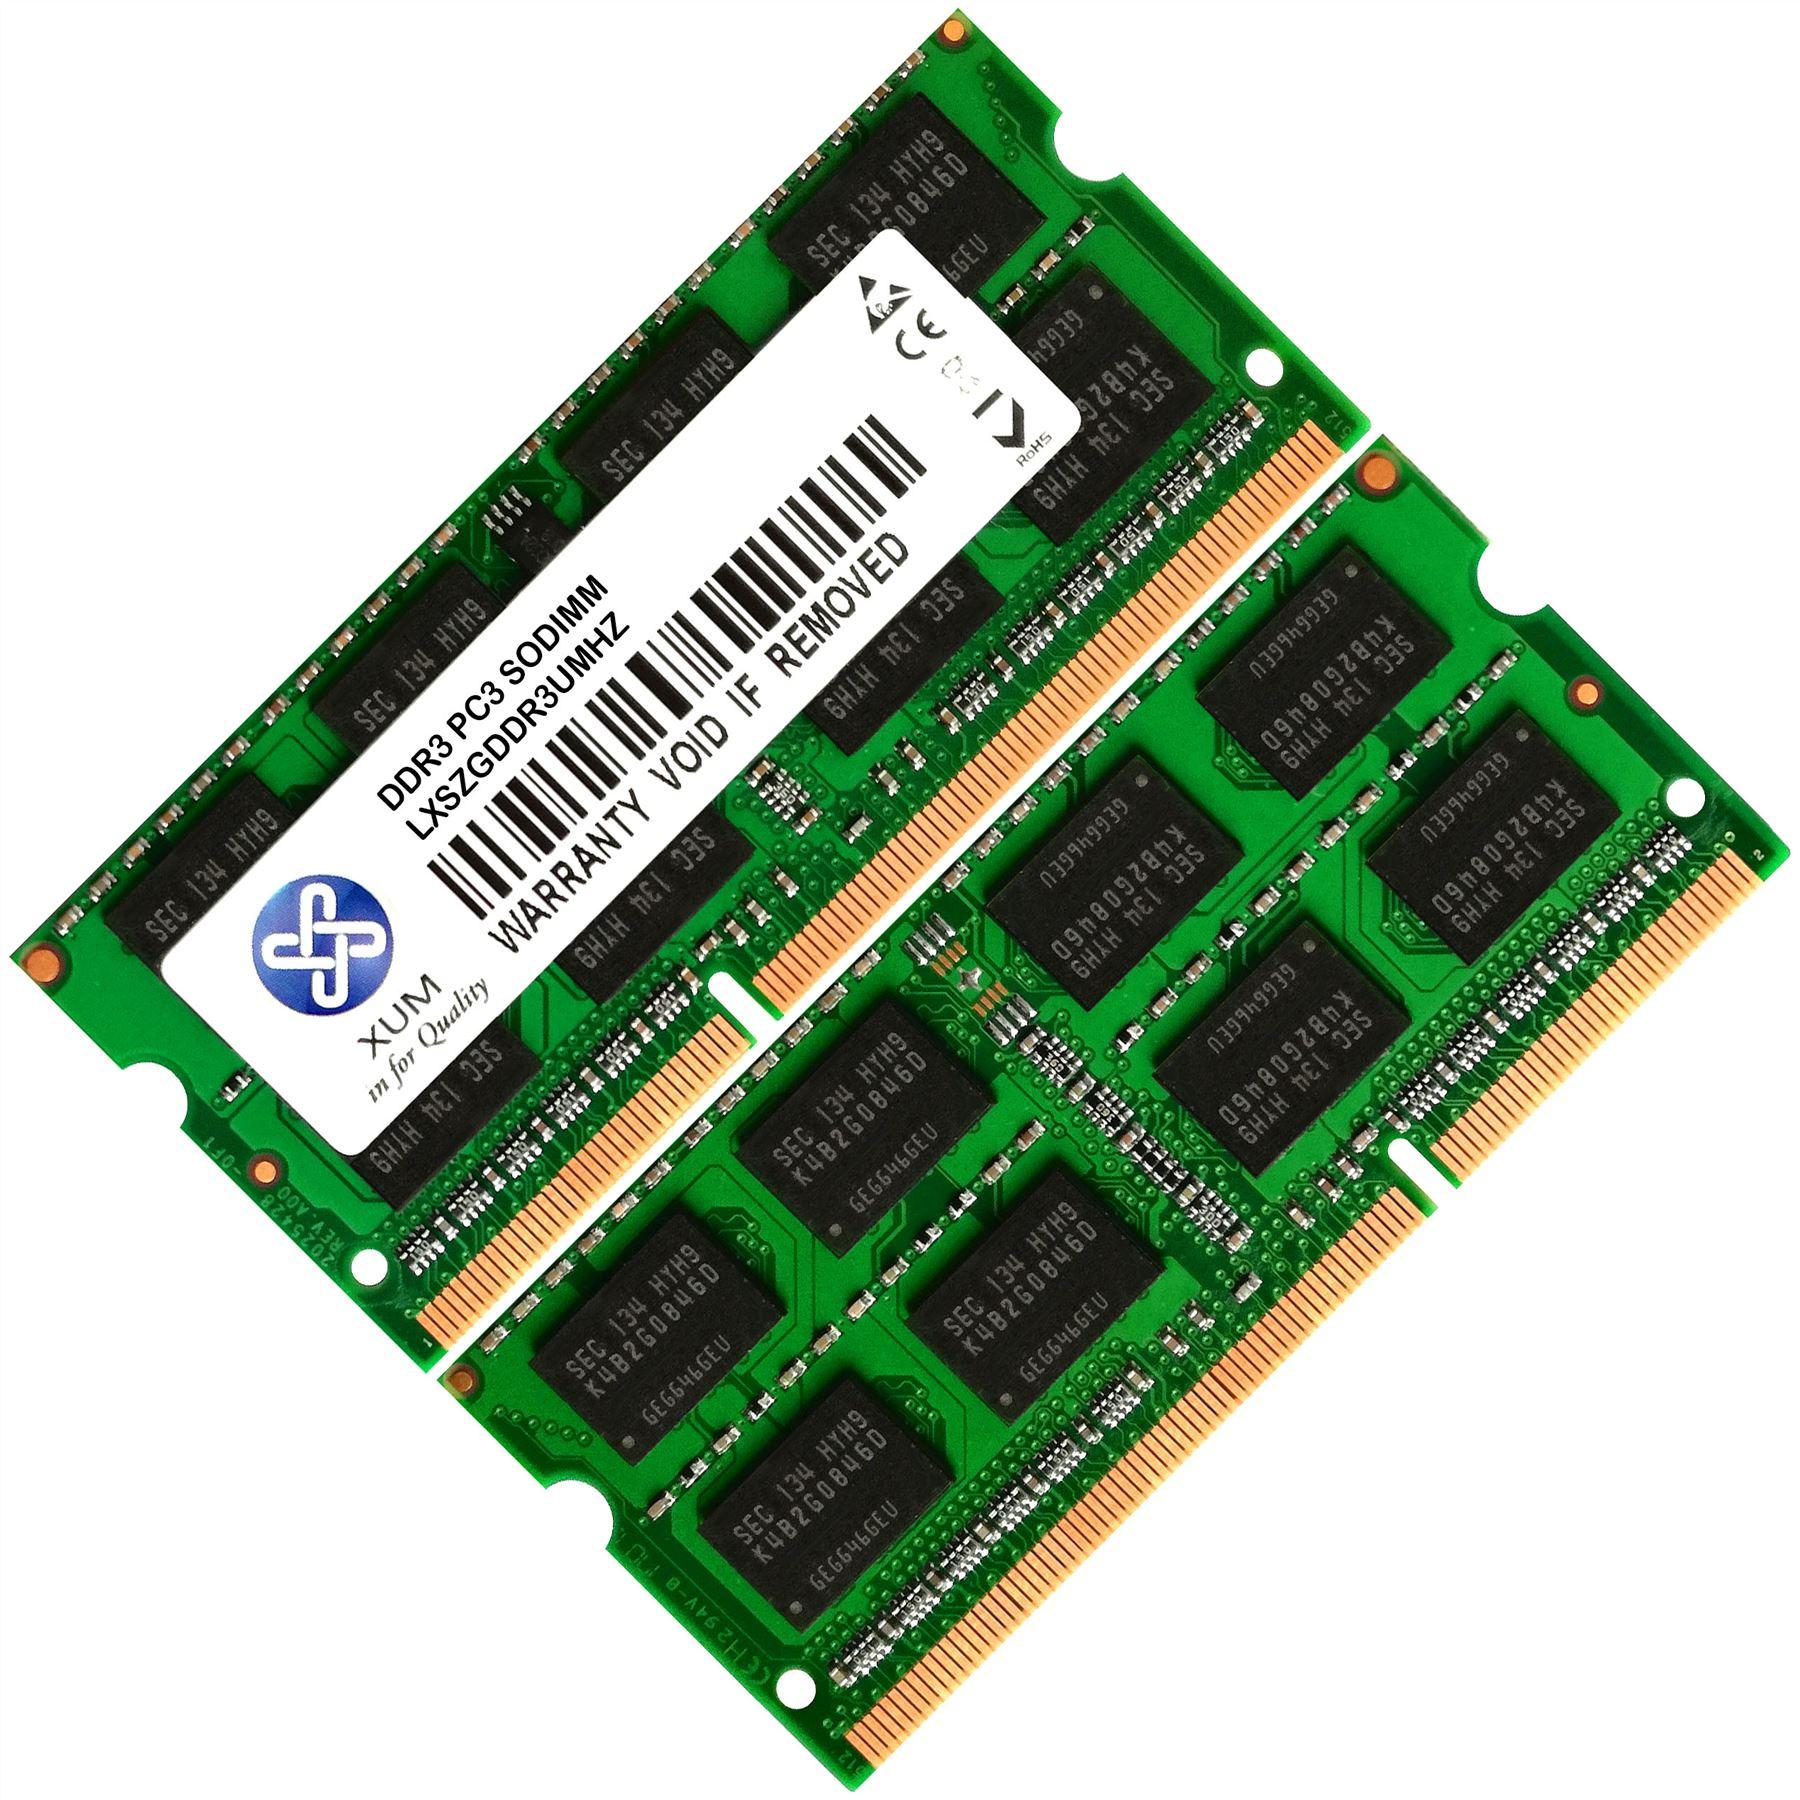 Memoria-Ram-Toshiba-Satellite-Laptop-C40-A-PSCD2M-01K008-Nuevo-Lot-DDR3-SDRAM